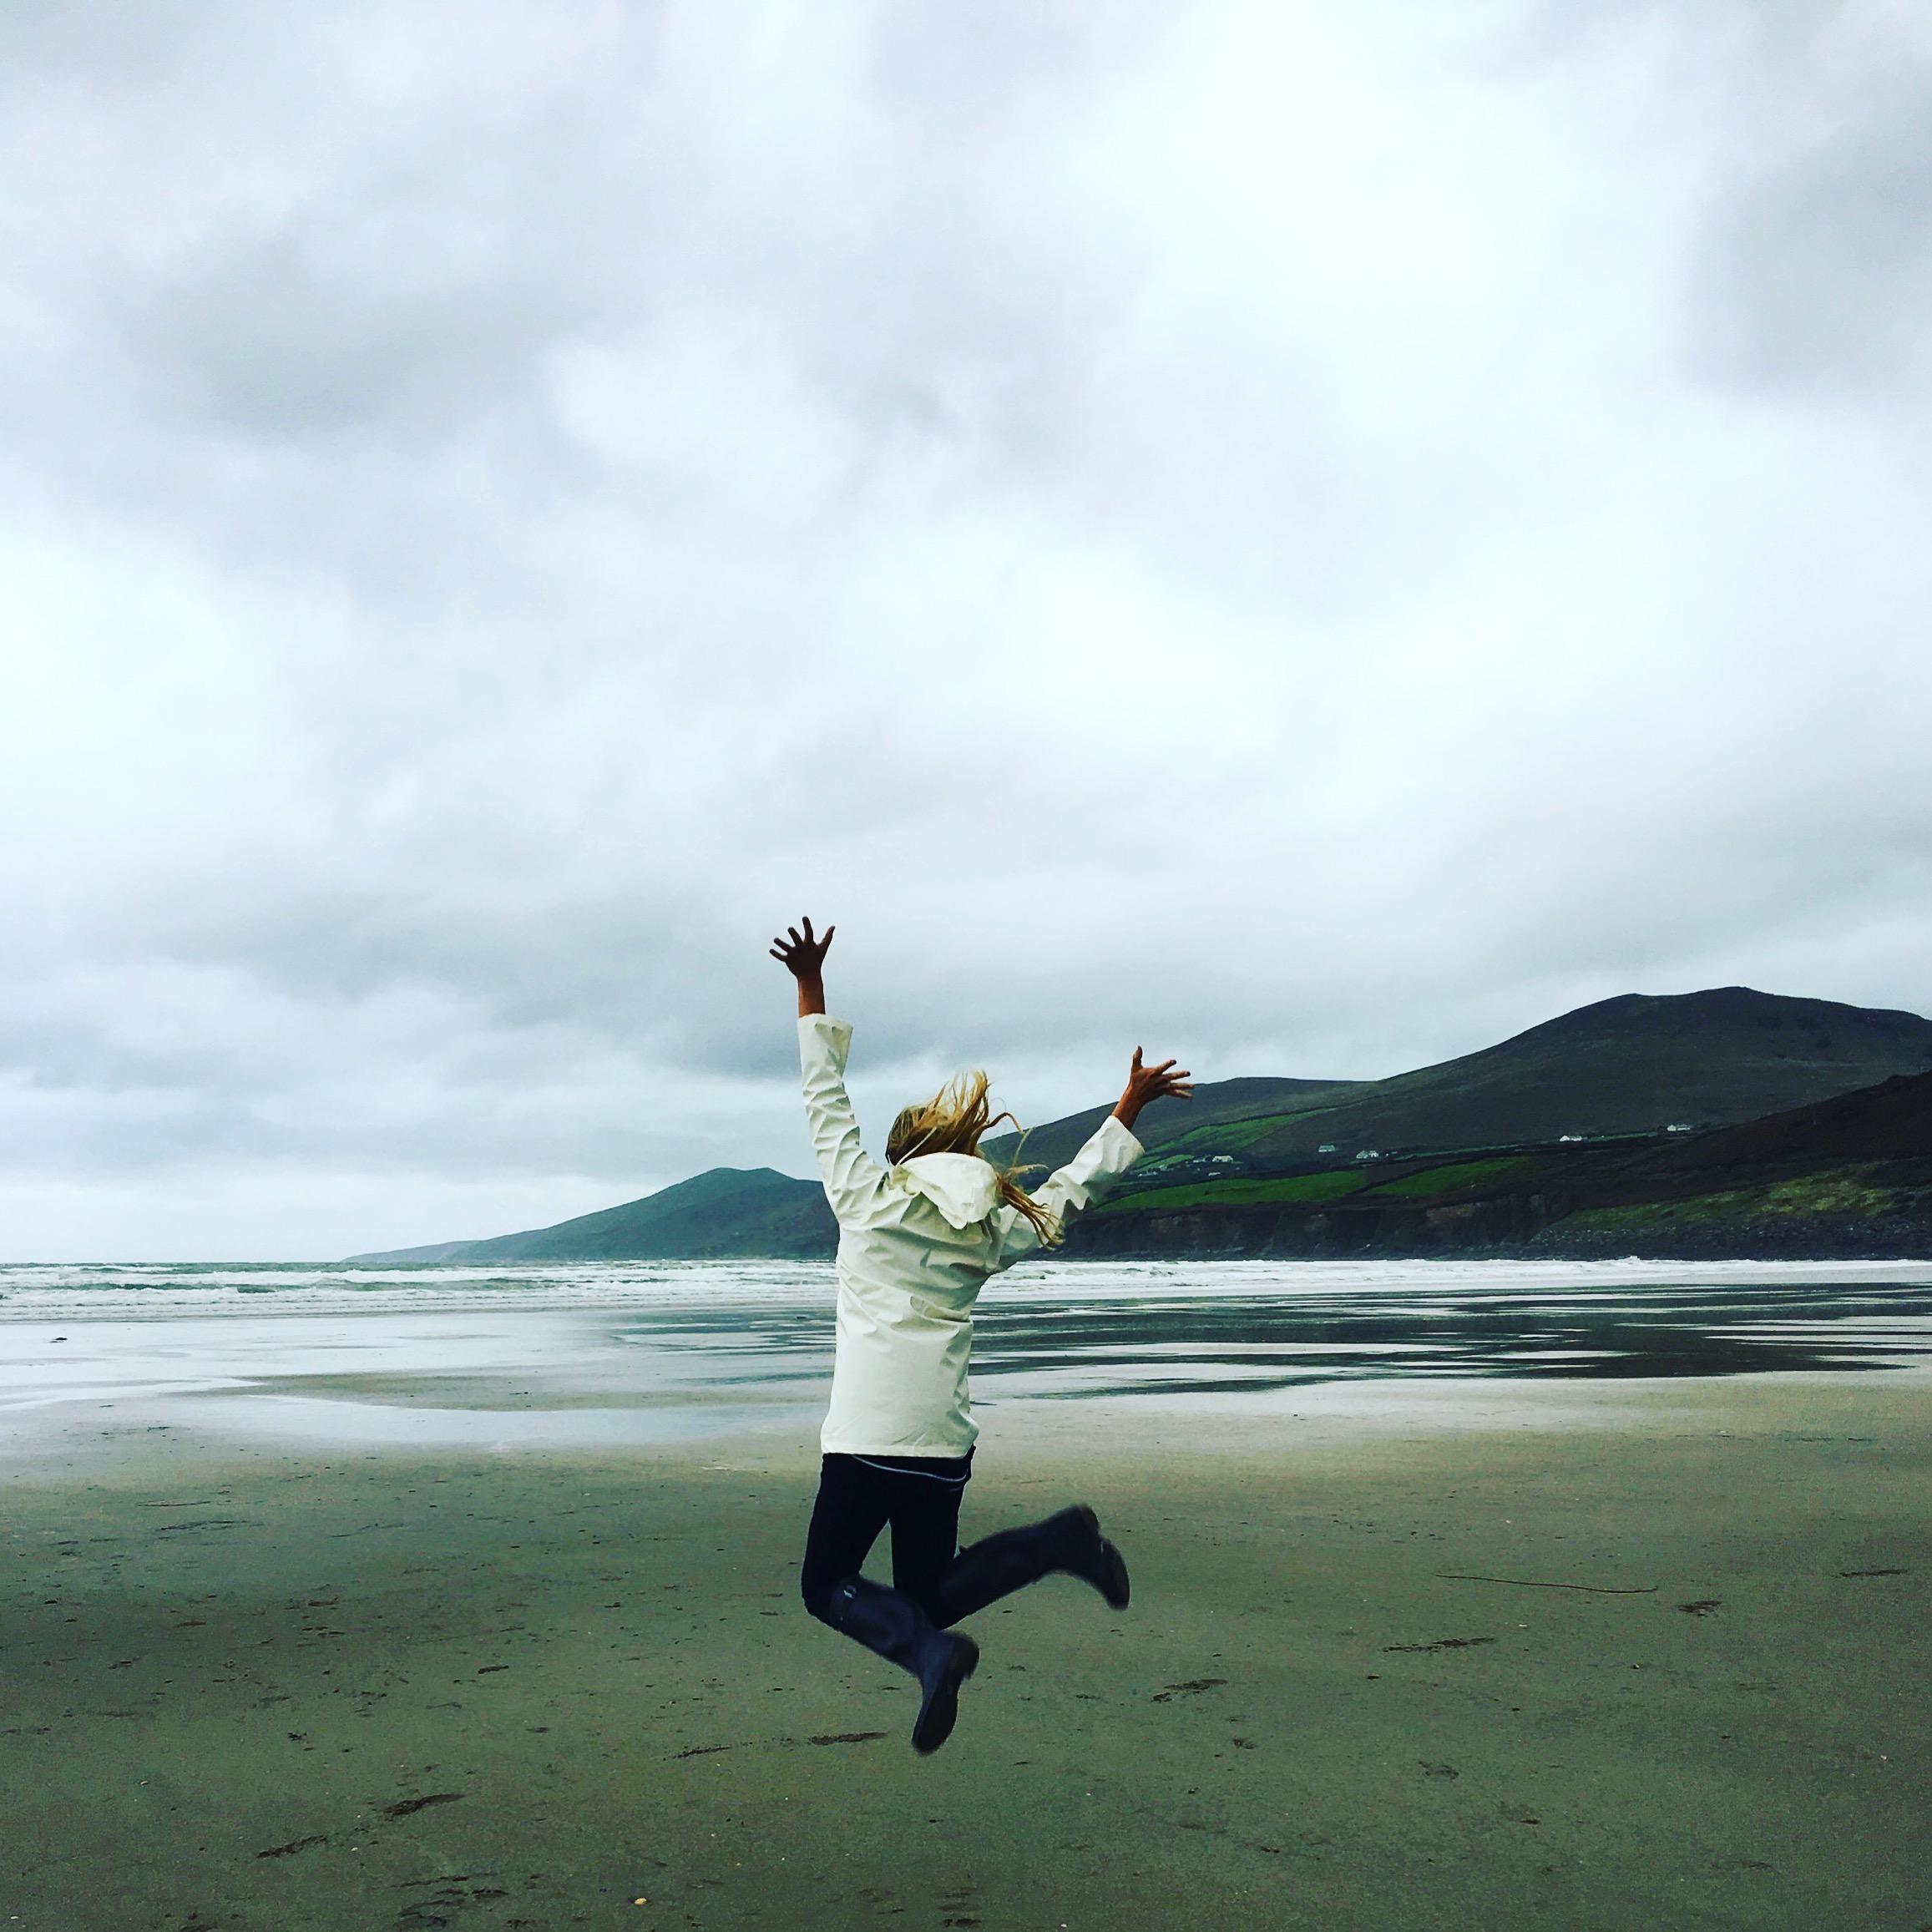 dingle ireland coastline